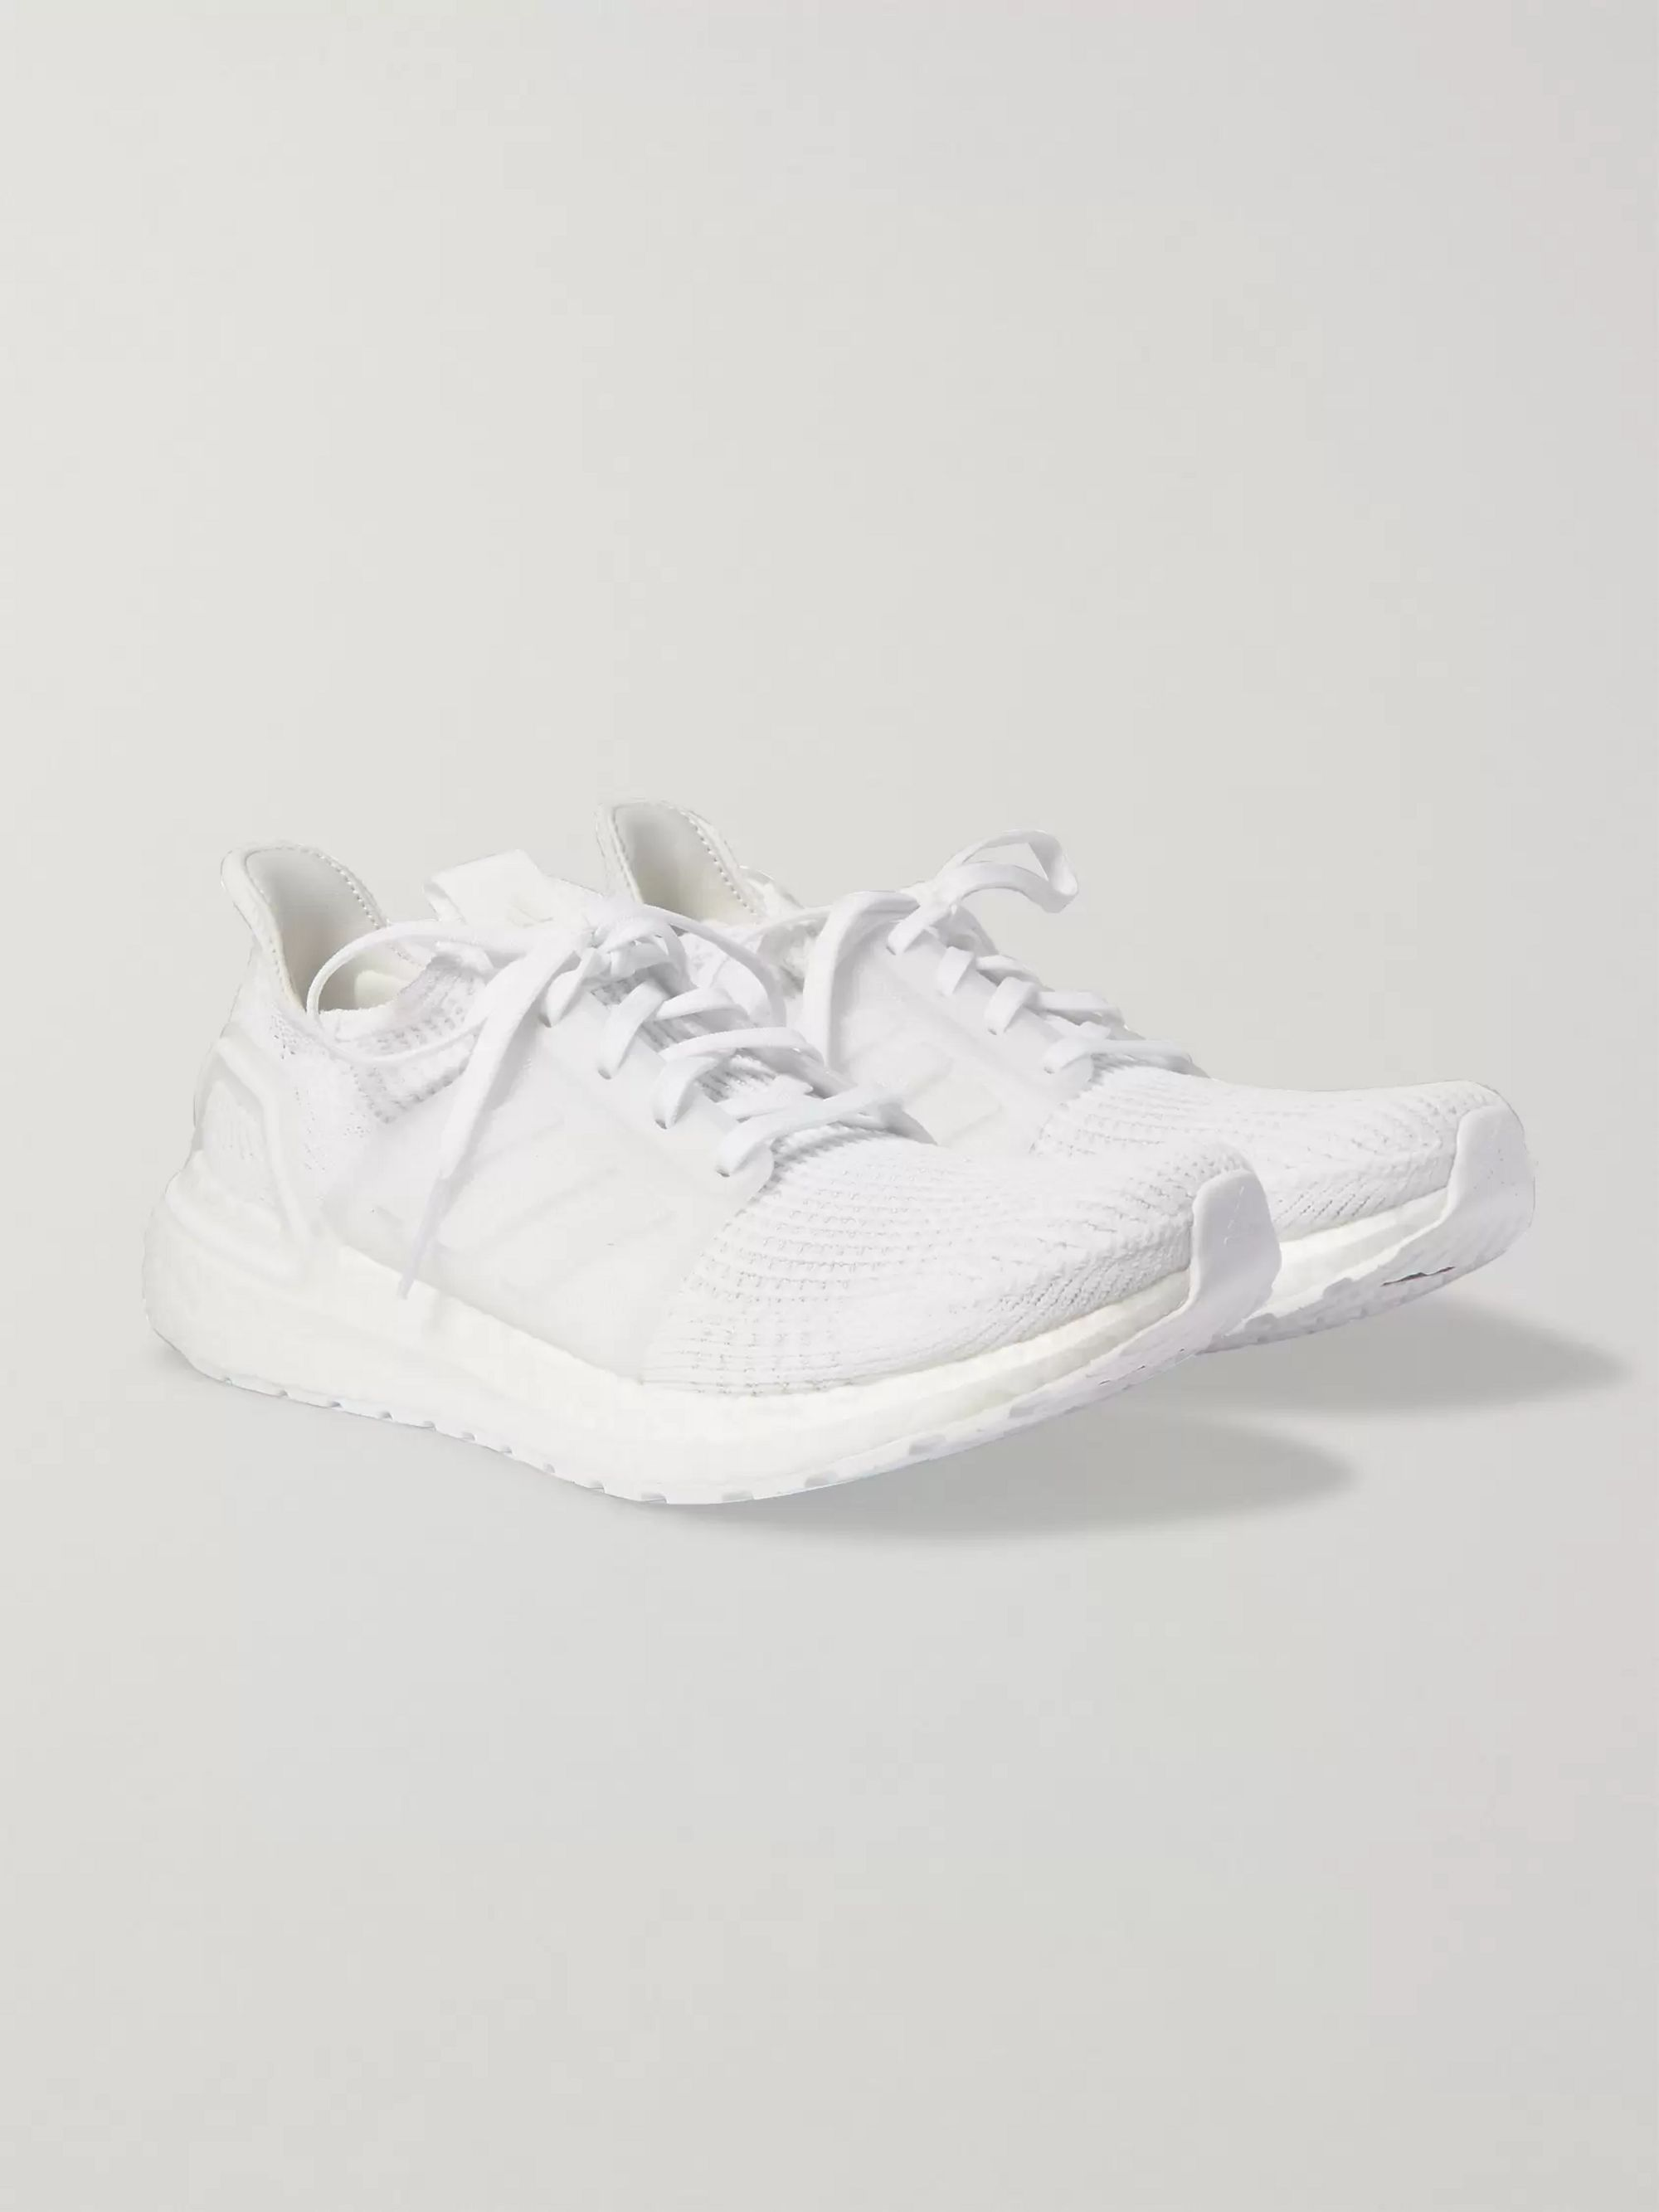 UltraBOOST 19 Rubber Trimmed Primeknit Running Sneakers